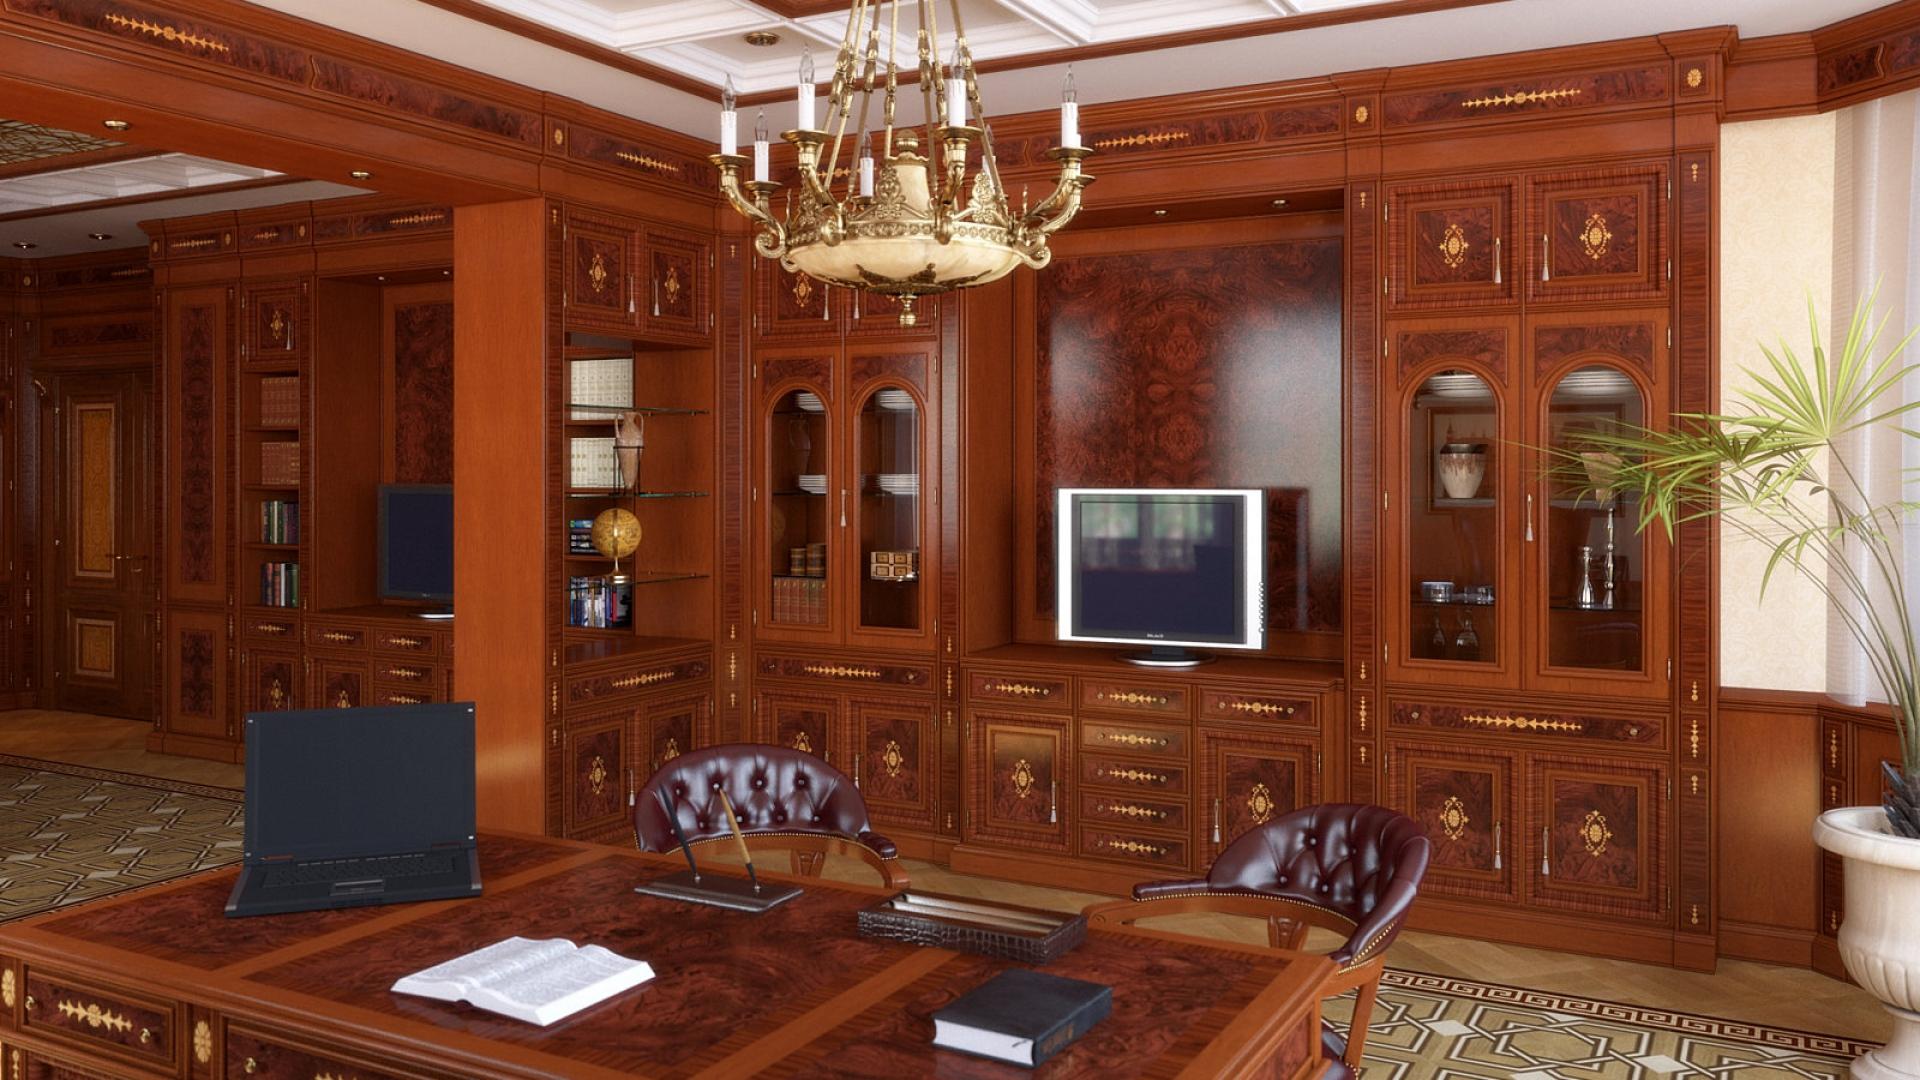 Download Wallpaper 1920x1080 Room Office Furniture Design Wood